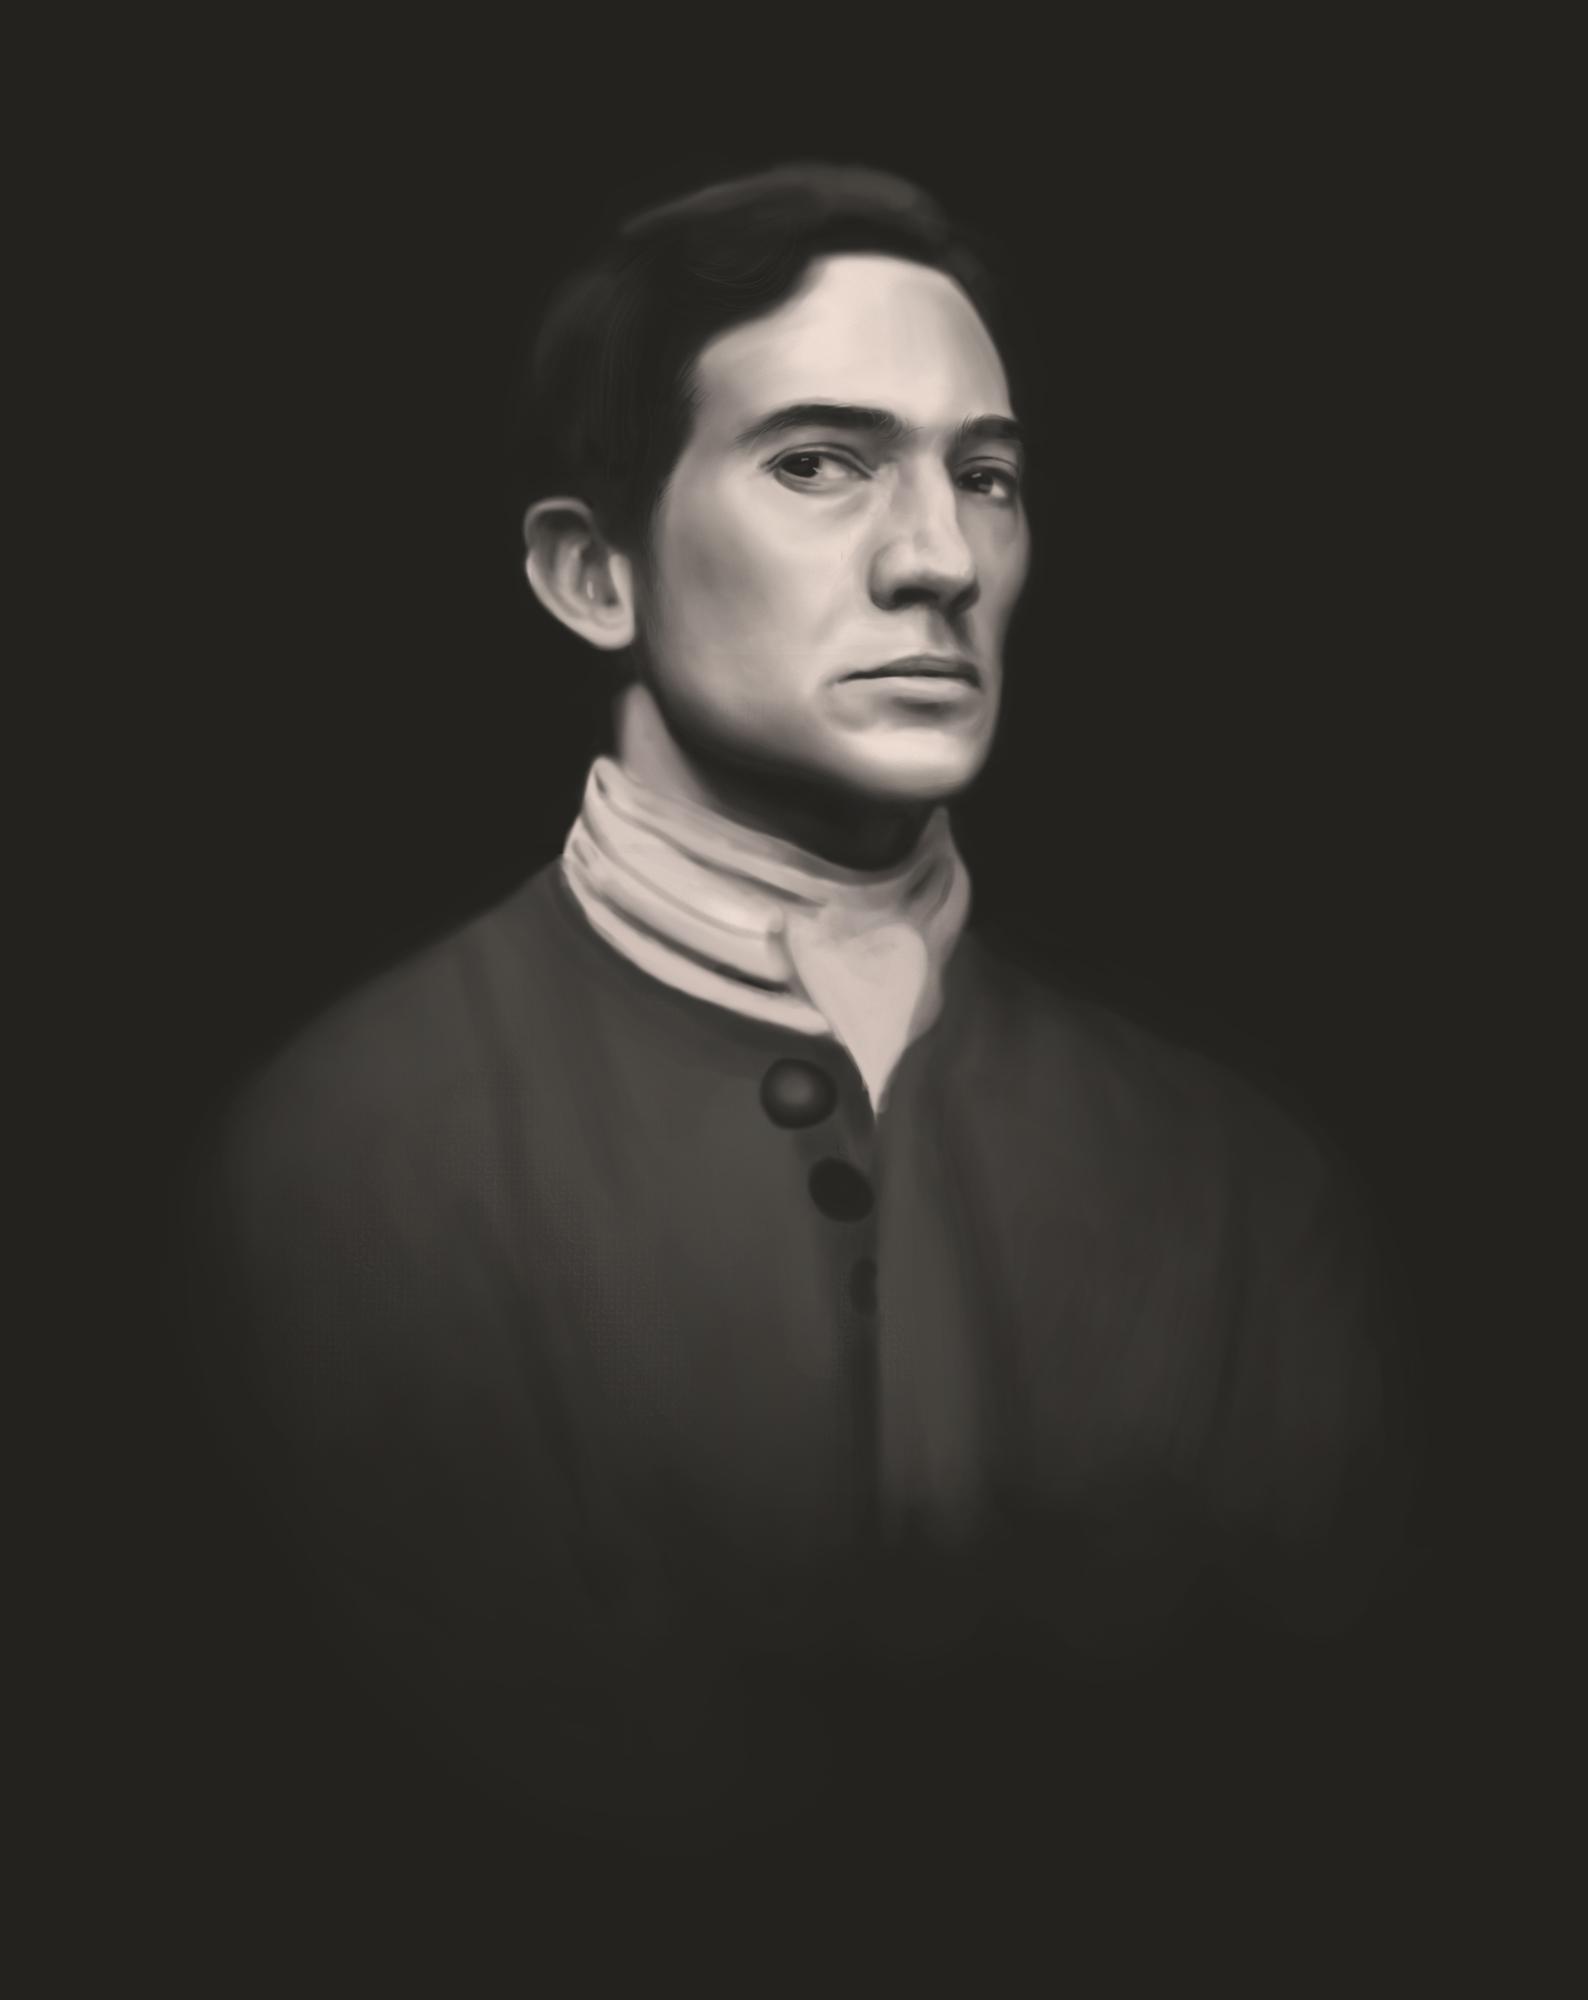 портрет графа.jpg